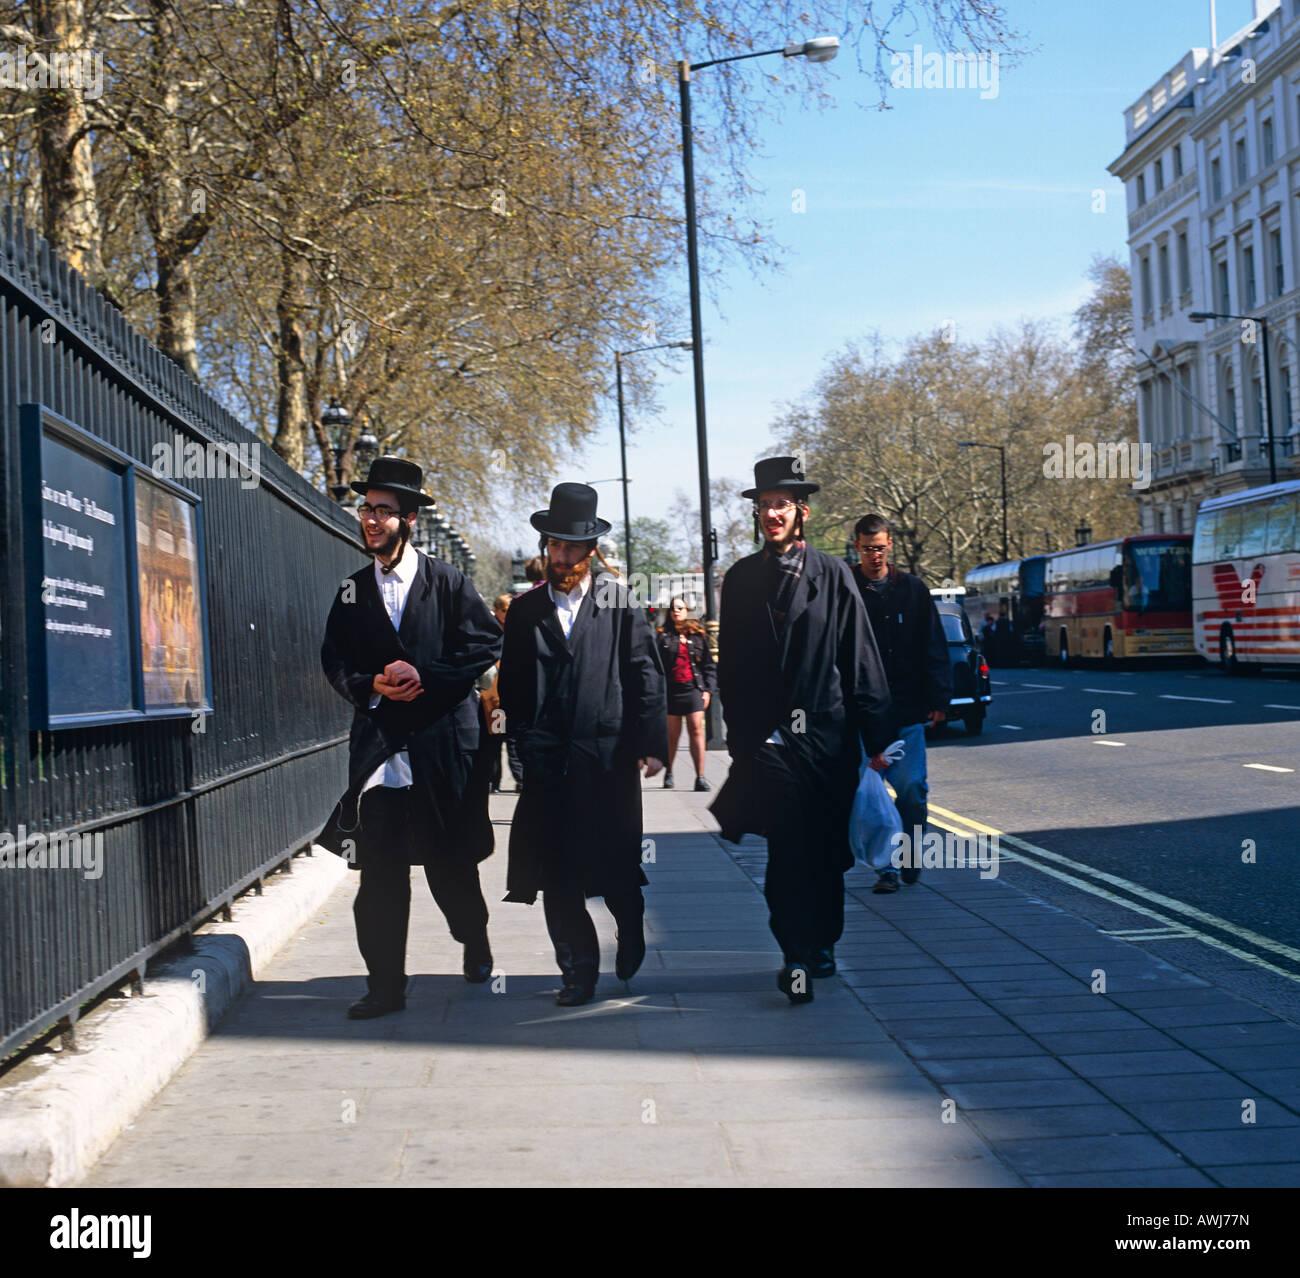 Orthadox Jews West End London UK Europe - Stock Image